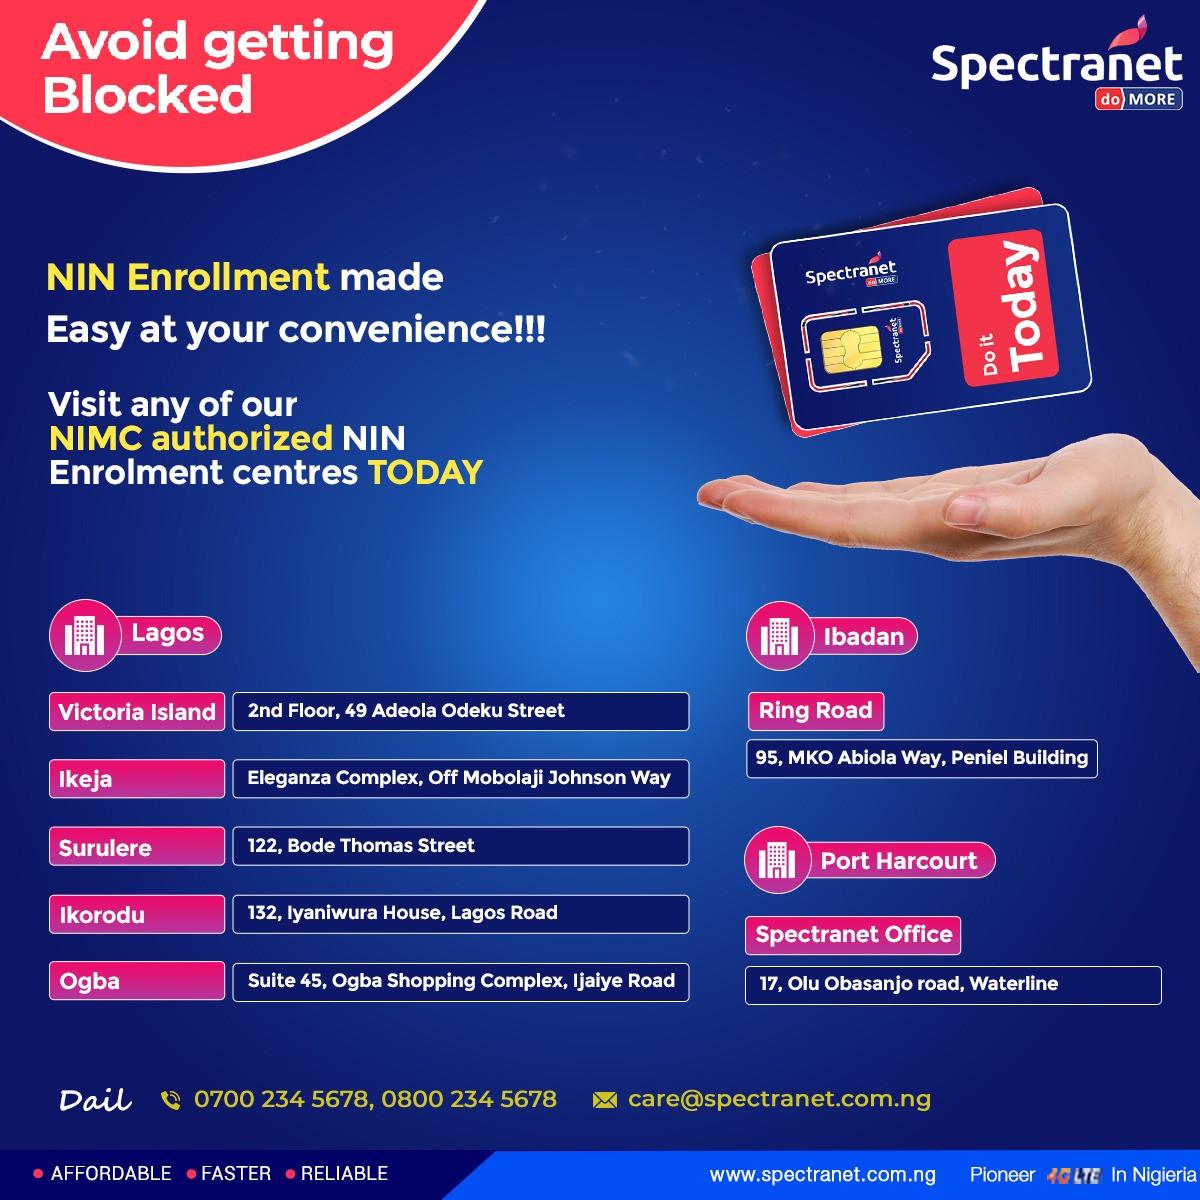 National Identity Management Commission Appoints Spectranet 4G for NIN Enrollment